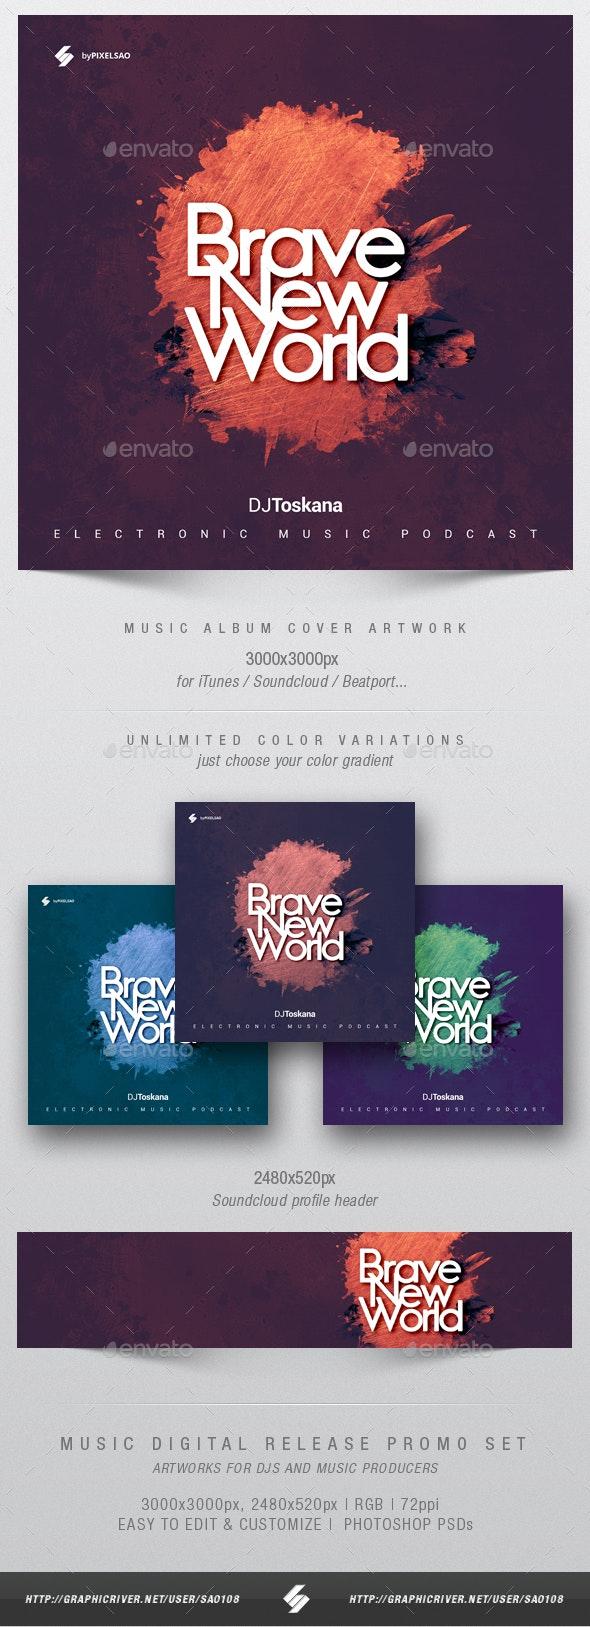 Brave New World - Music Album Cover Artwork Template - Miscellaneous Social Media